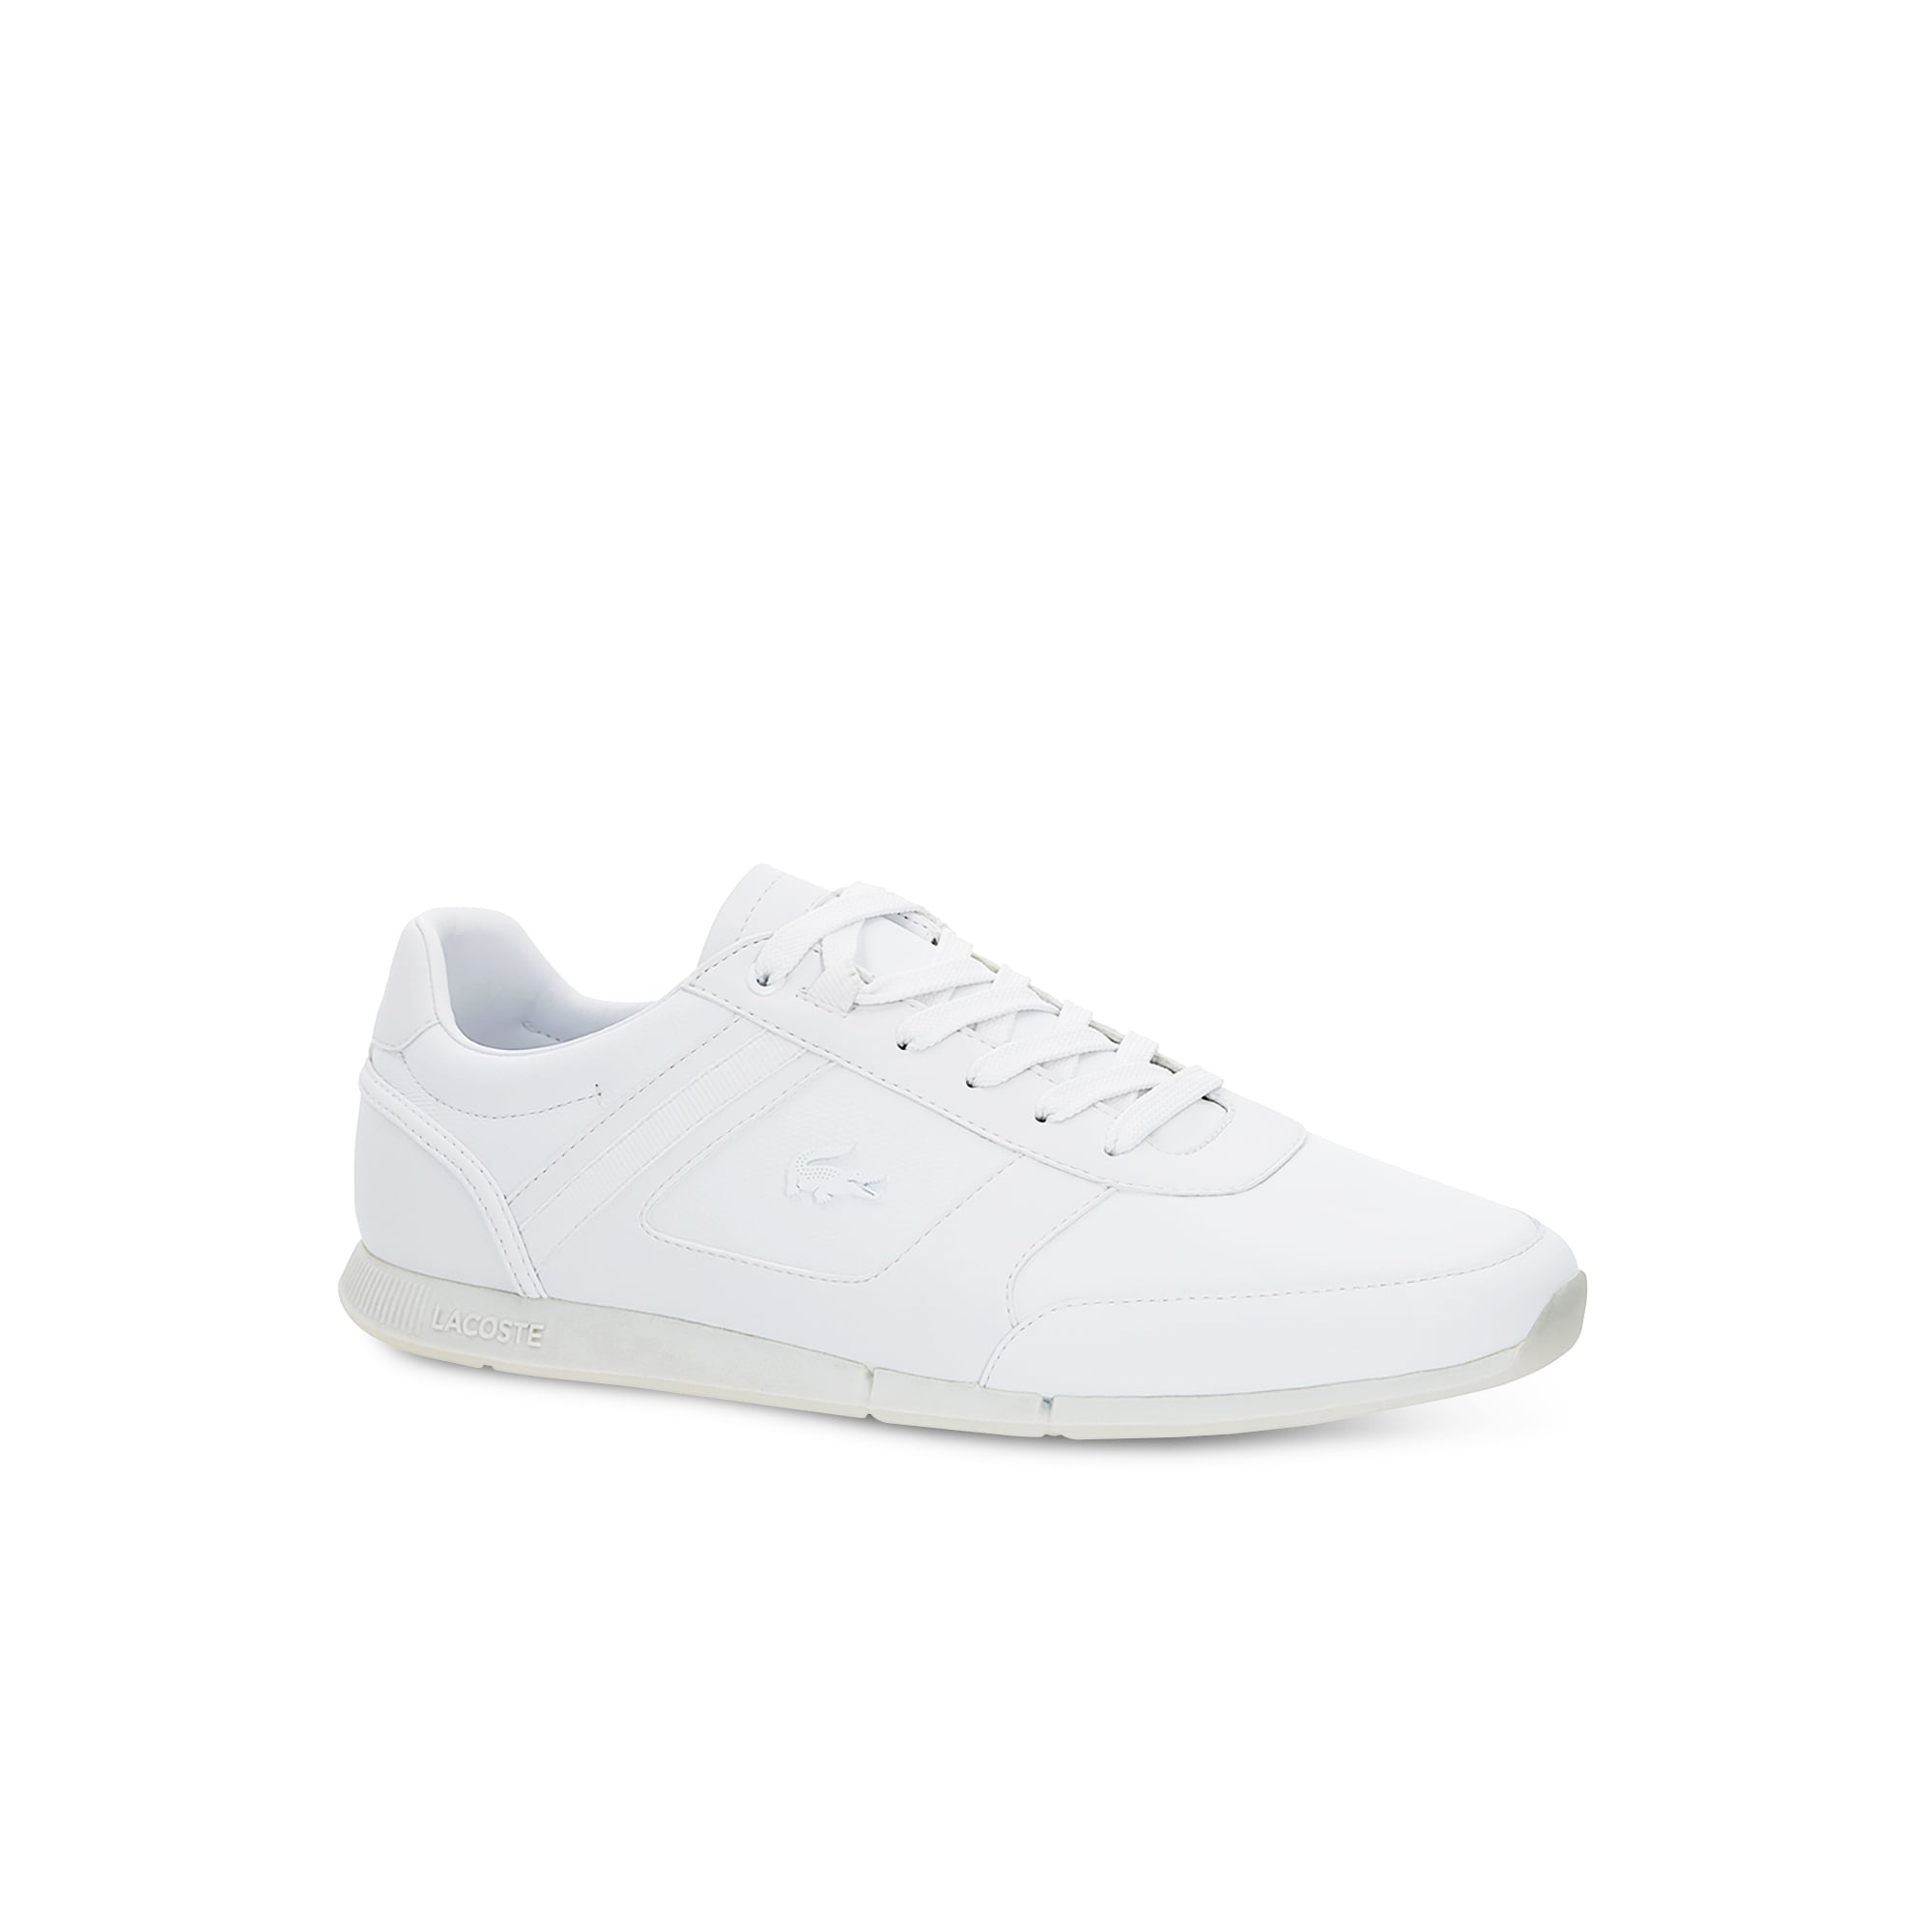 2f0d9f33dd68 Men s Menerva Leather Sneakers